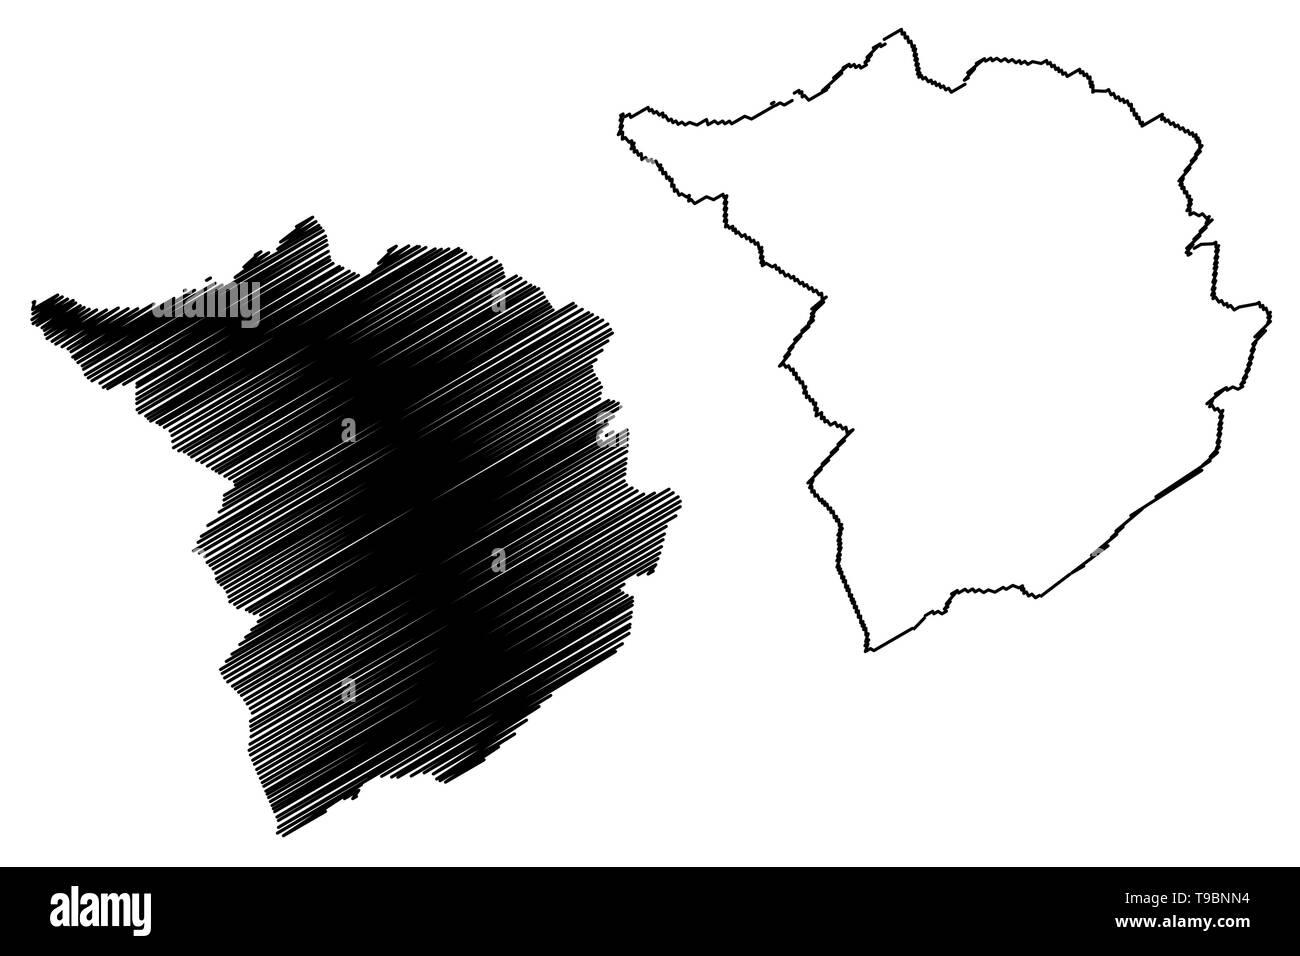 Tlemcen Province (Provinces of Algeria, Peoples Democratic Republic of Algeria) map vector illustration, scribble sketch Tlemcen map - Stock Image